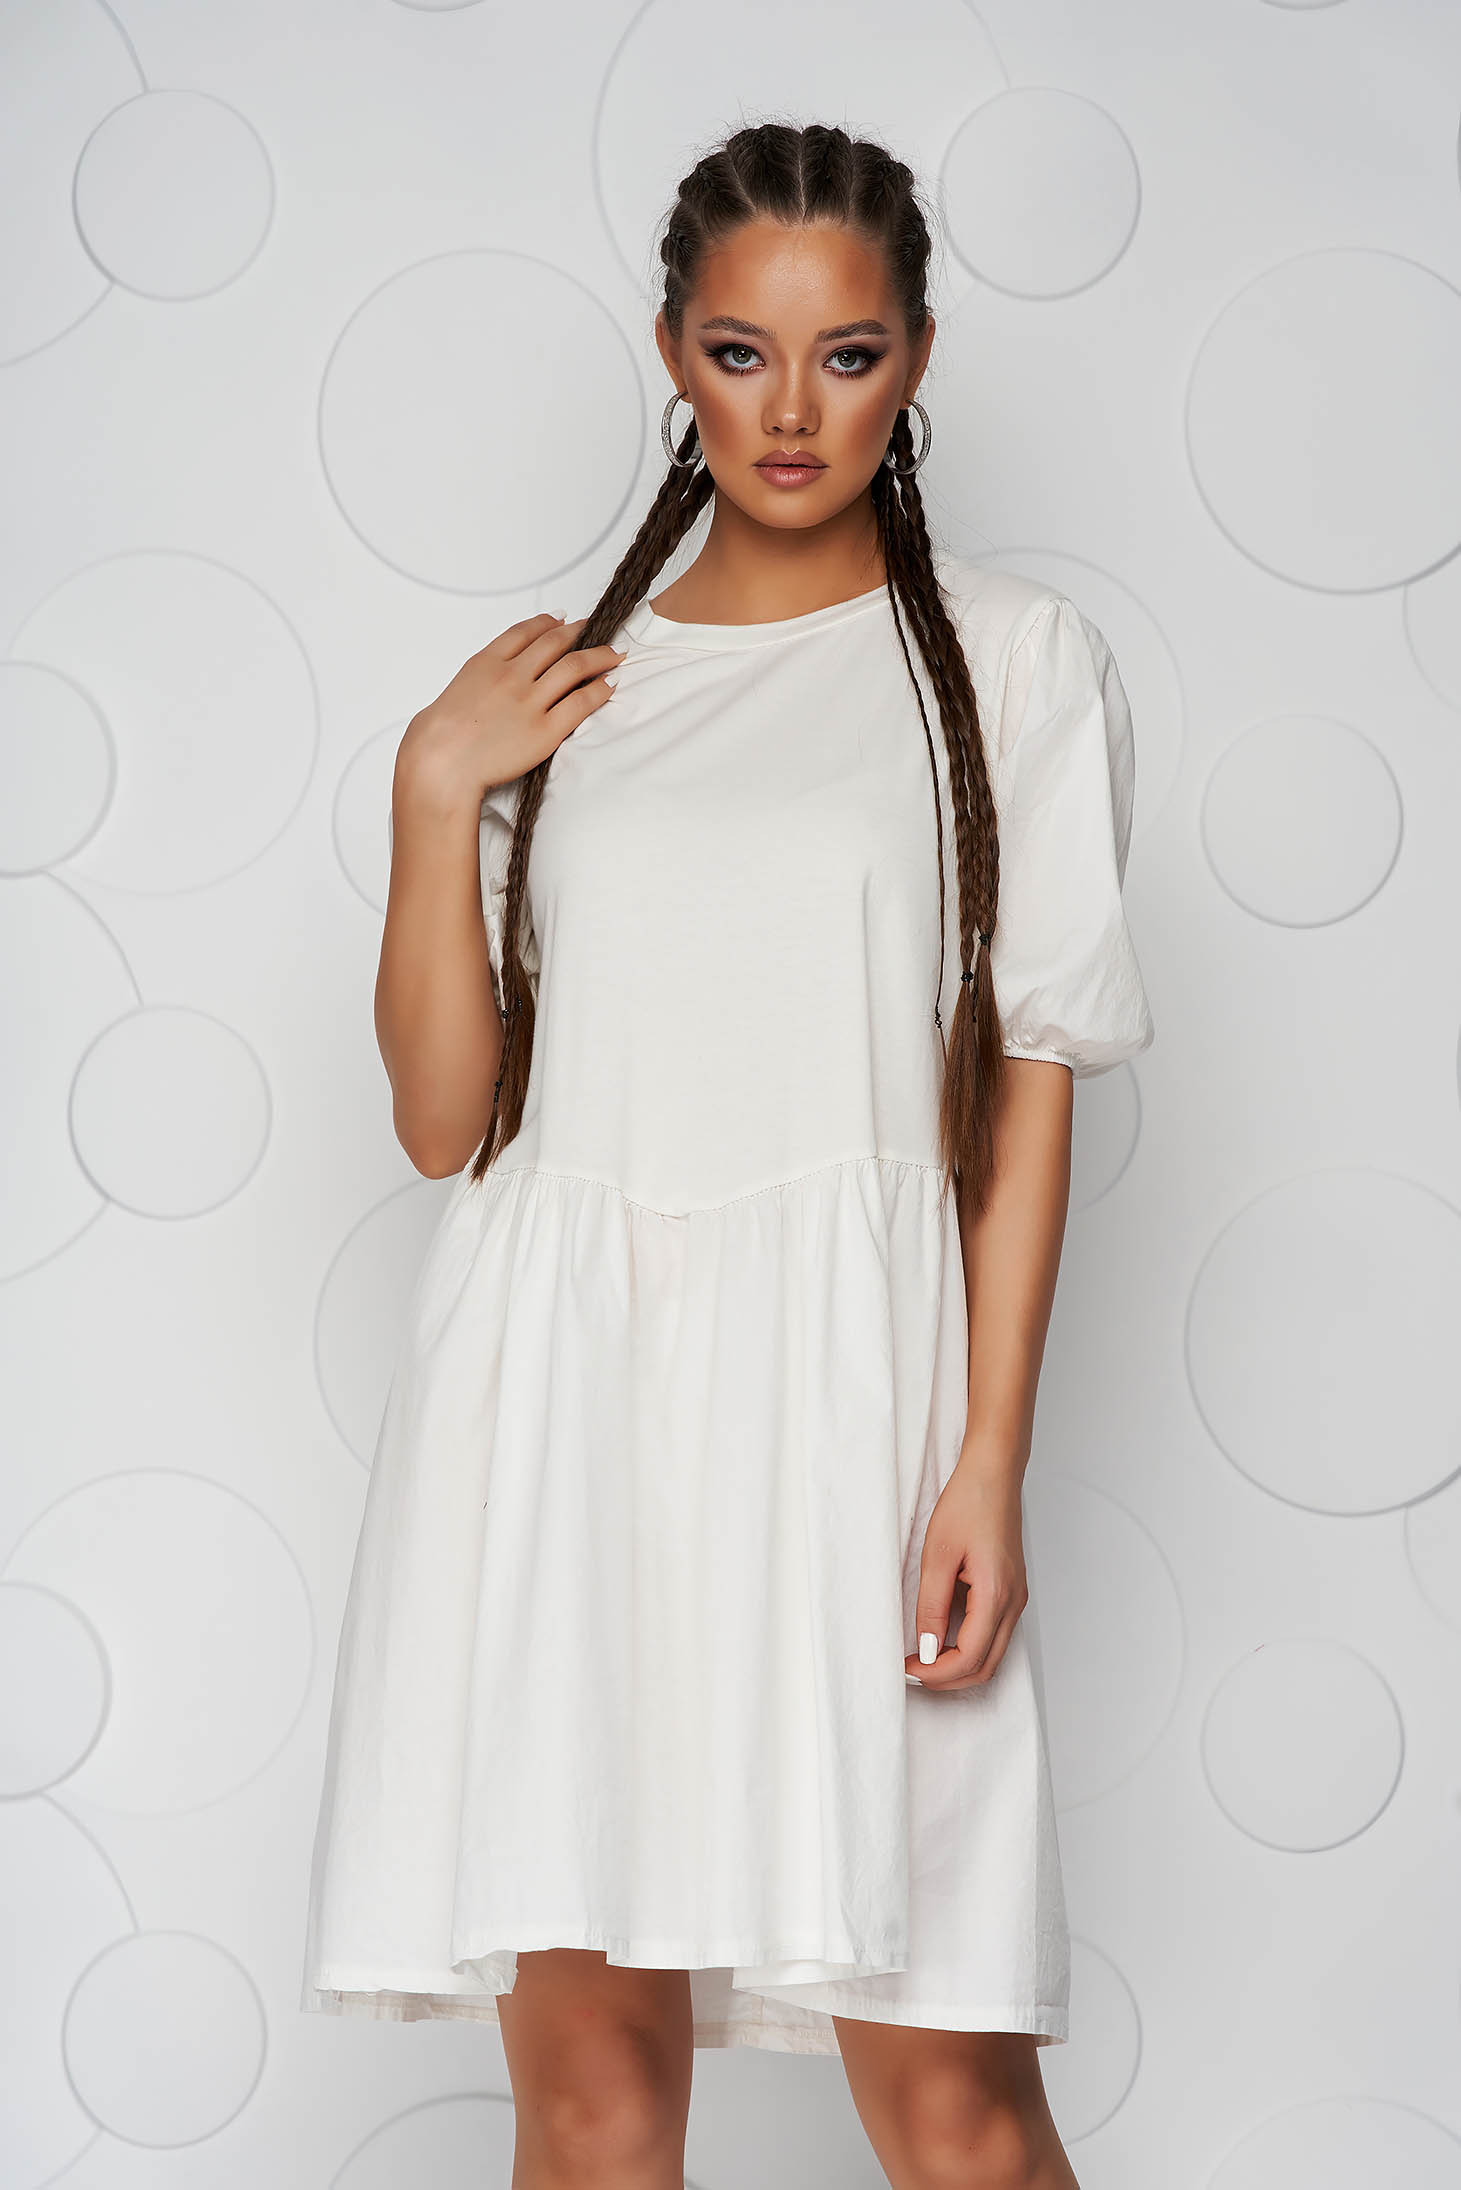 Ivory dress short cut cotton loose fit short sleeves elastic held sleeves